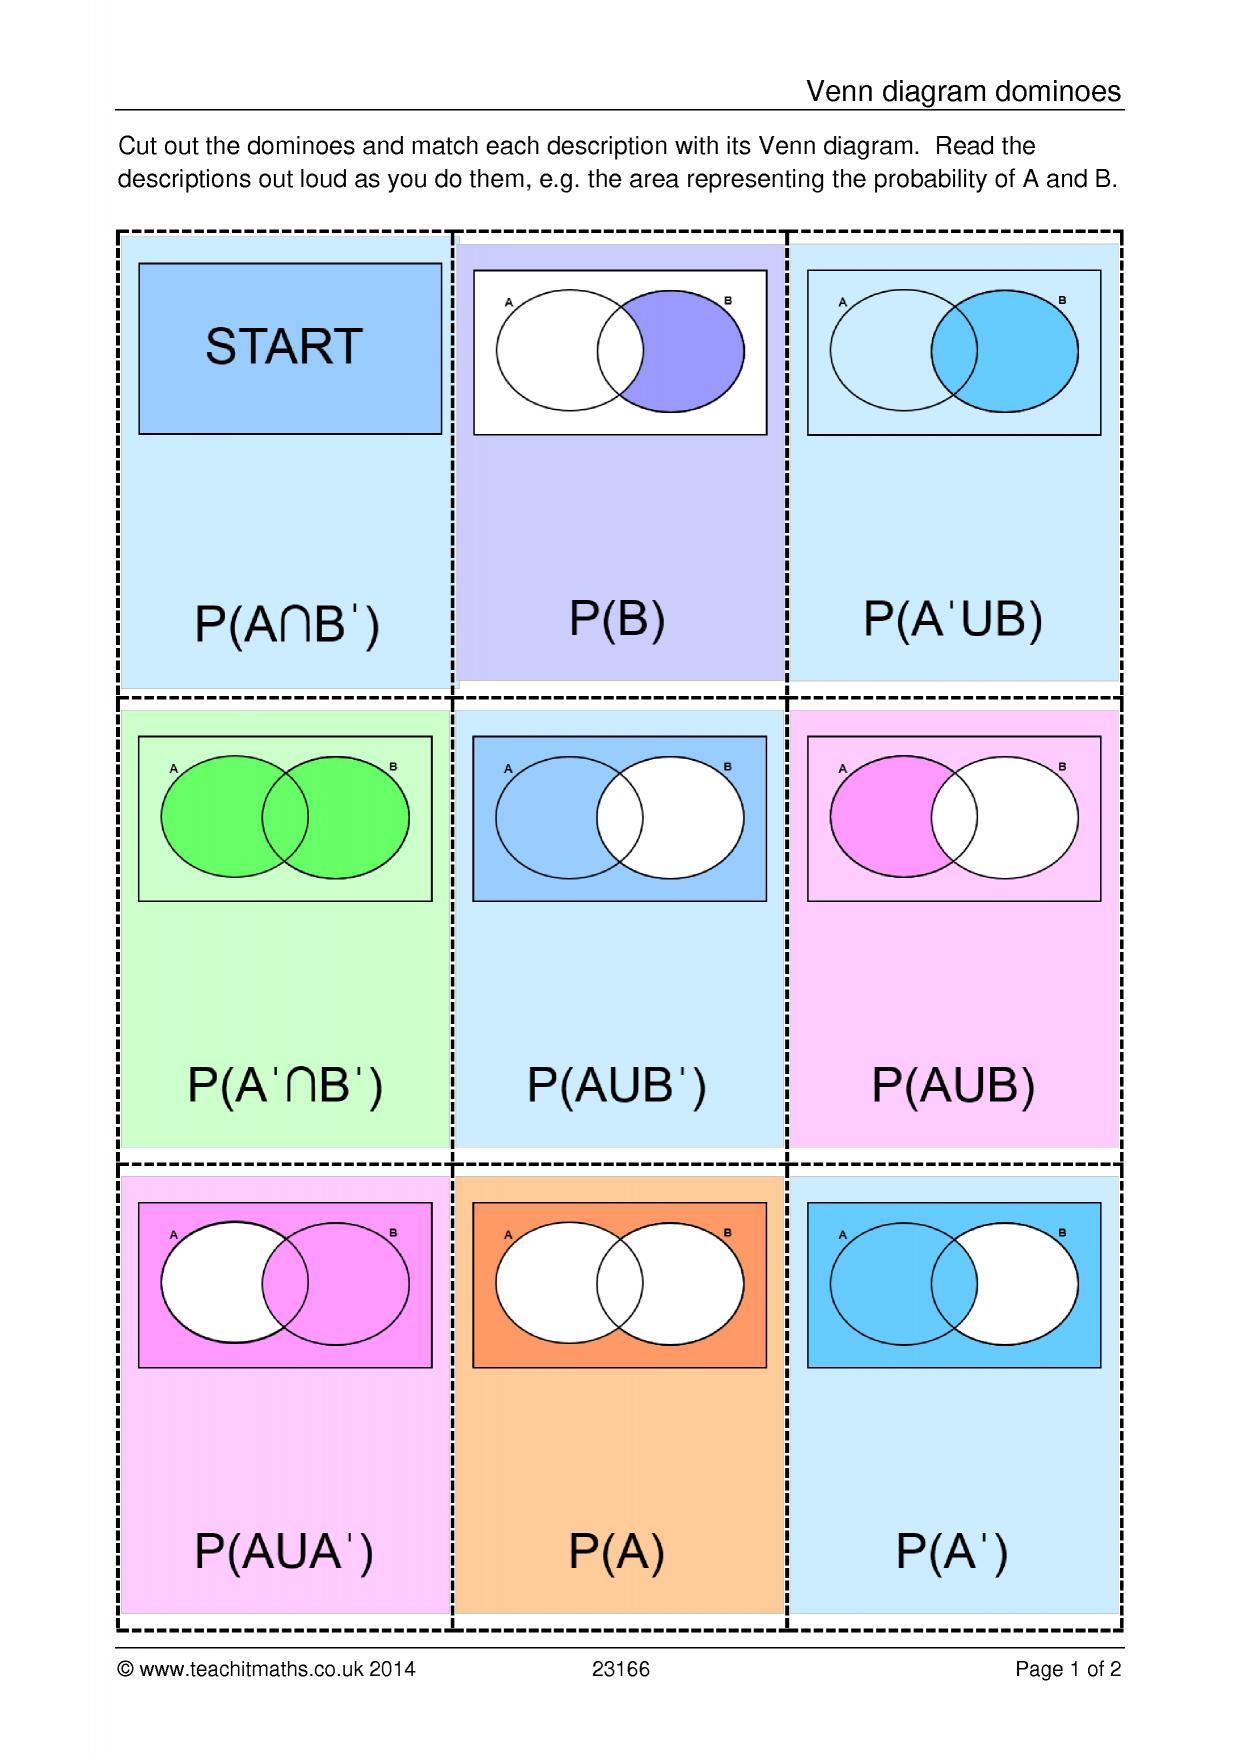 venn diagram math division fender stratocaster wire dominoes probability diagrams